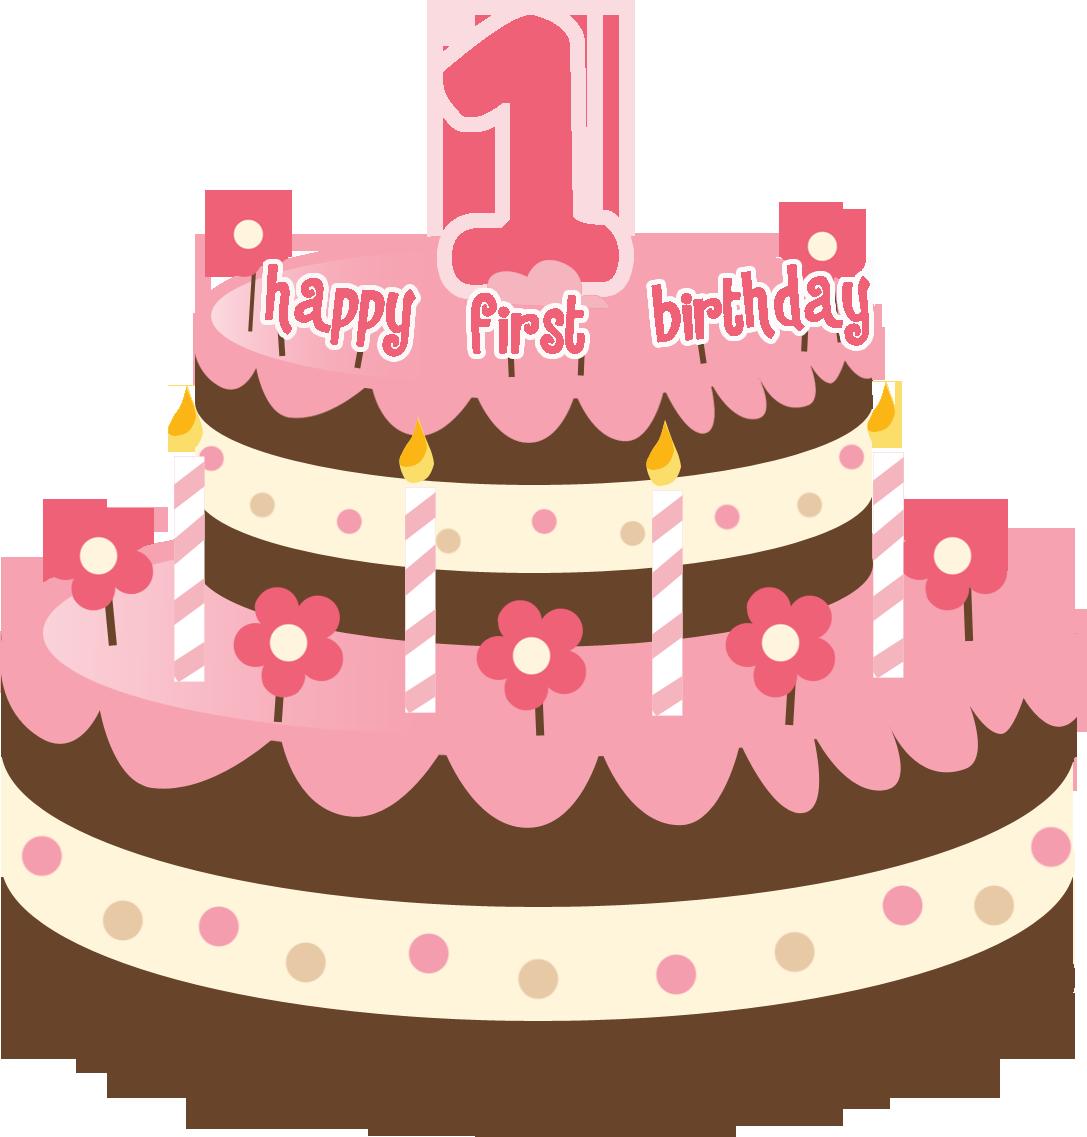 Birthday Cake Clip Art Png-birthday cake clip art png-6